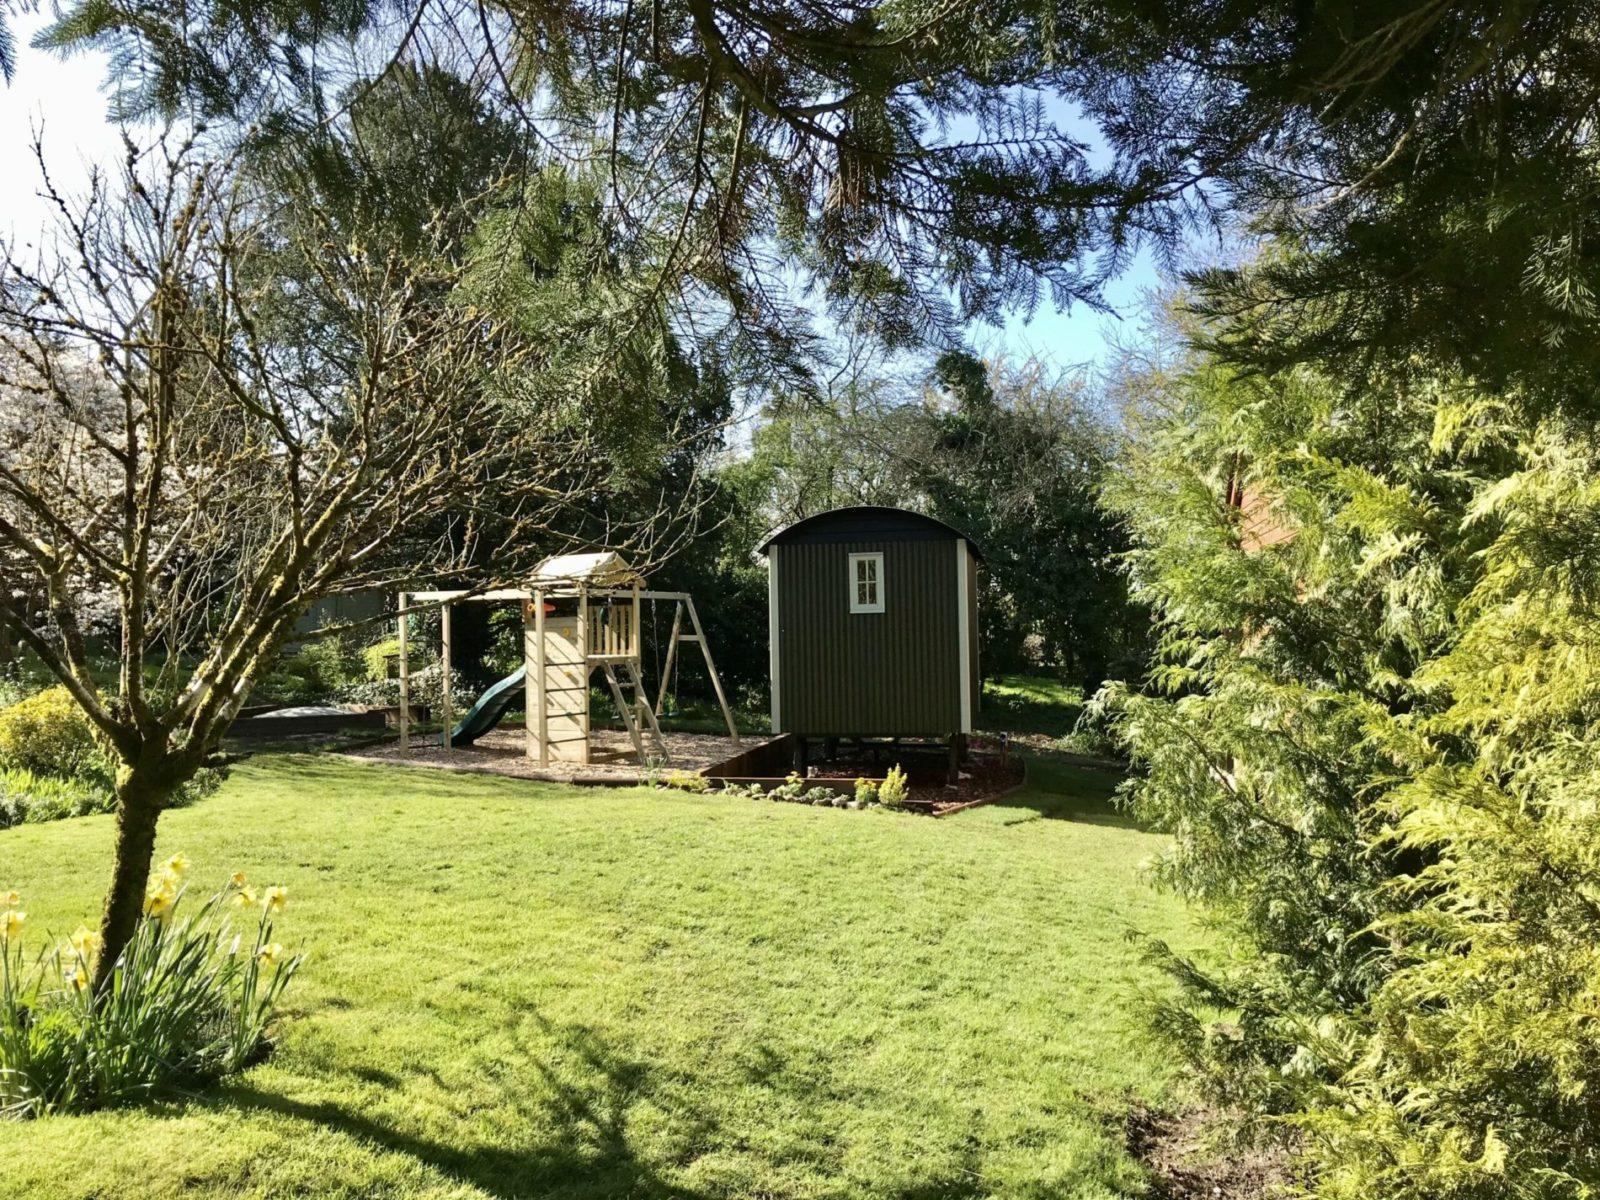 Beck Cottage Shepherd's Hut in garden